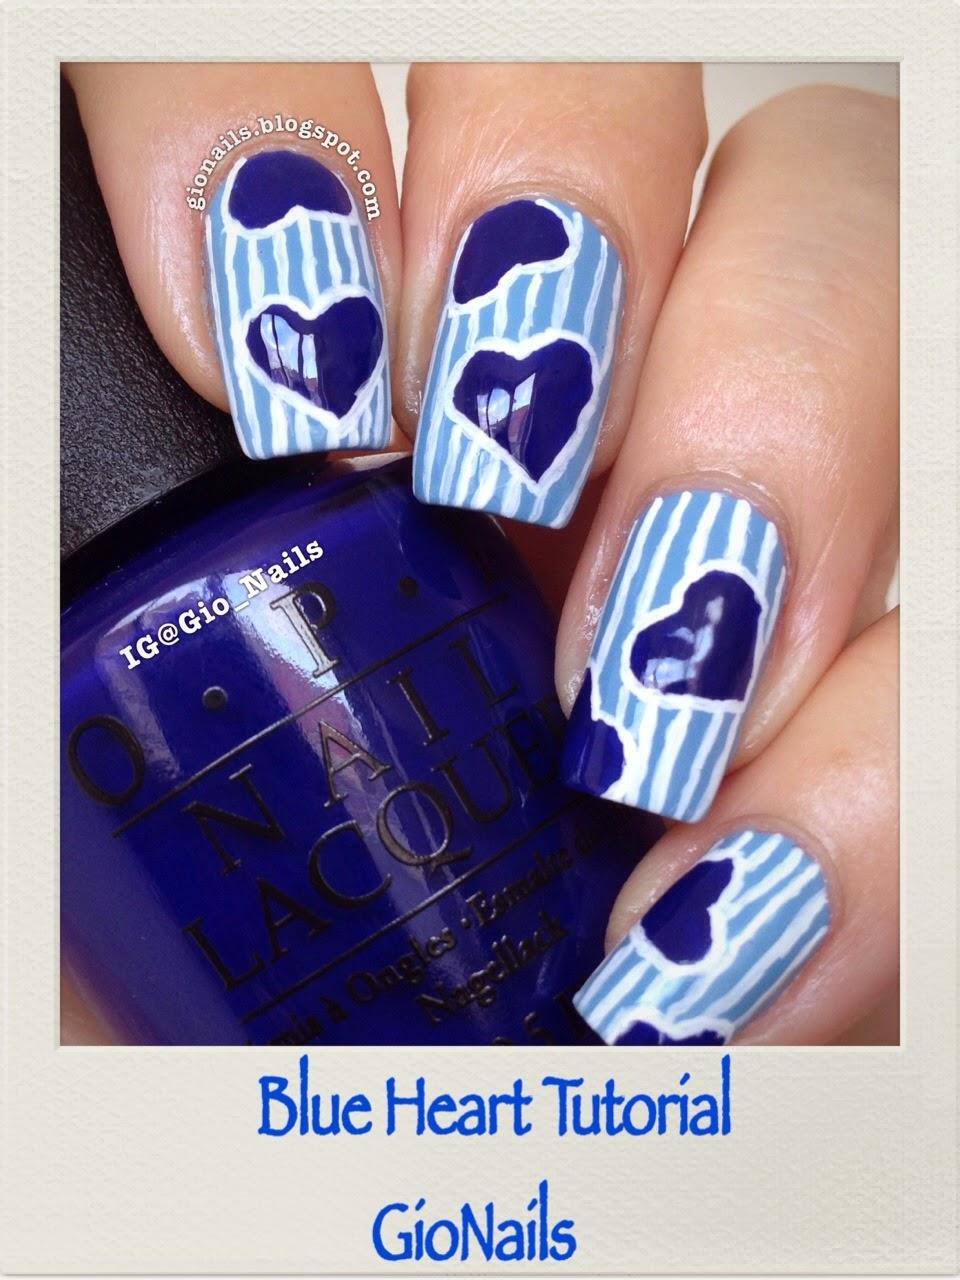 http://gionails.blogspot.be/2014/03/tutorial-blue-heart.html